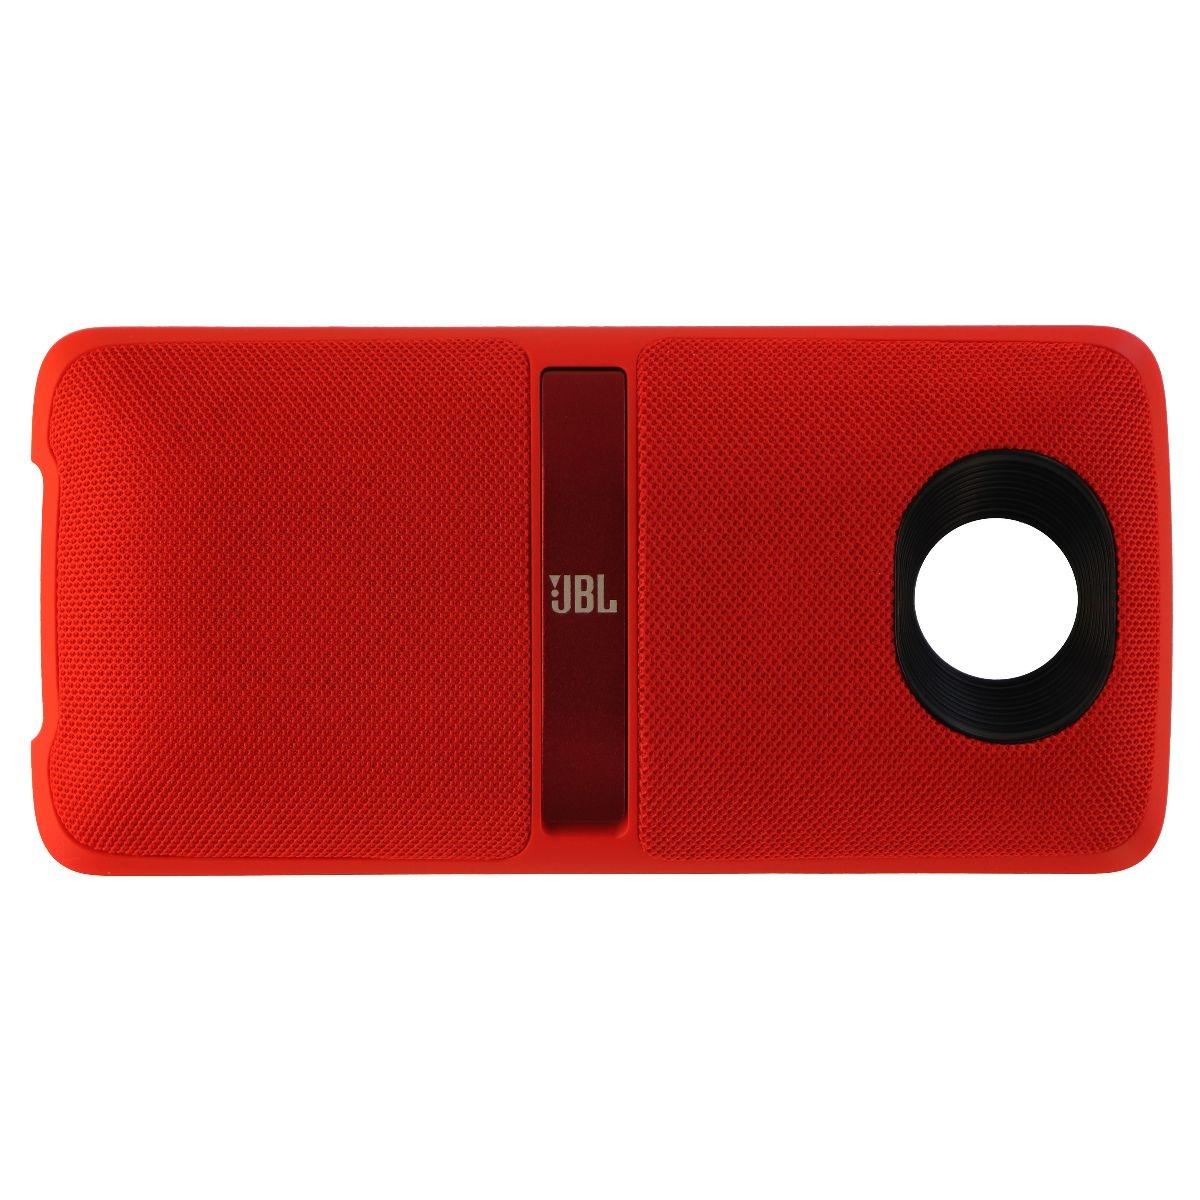 JBL MotoMod Soundboost 2 Audio Speaker Mod for Motorola Moto Z Phones - Red